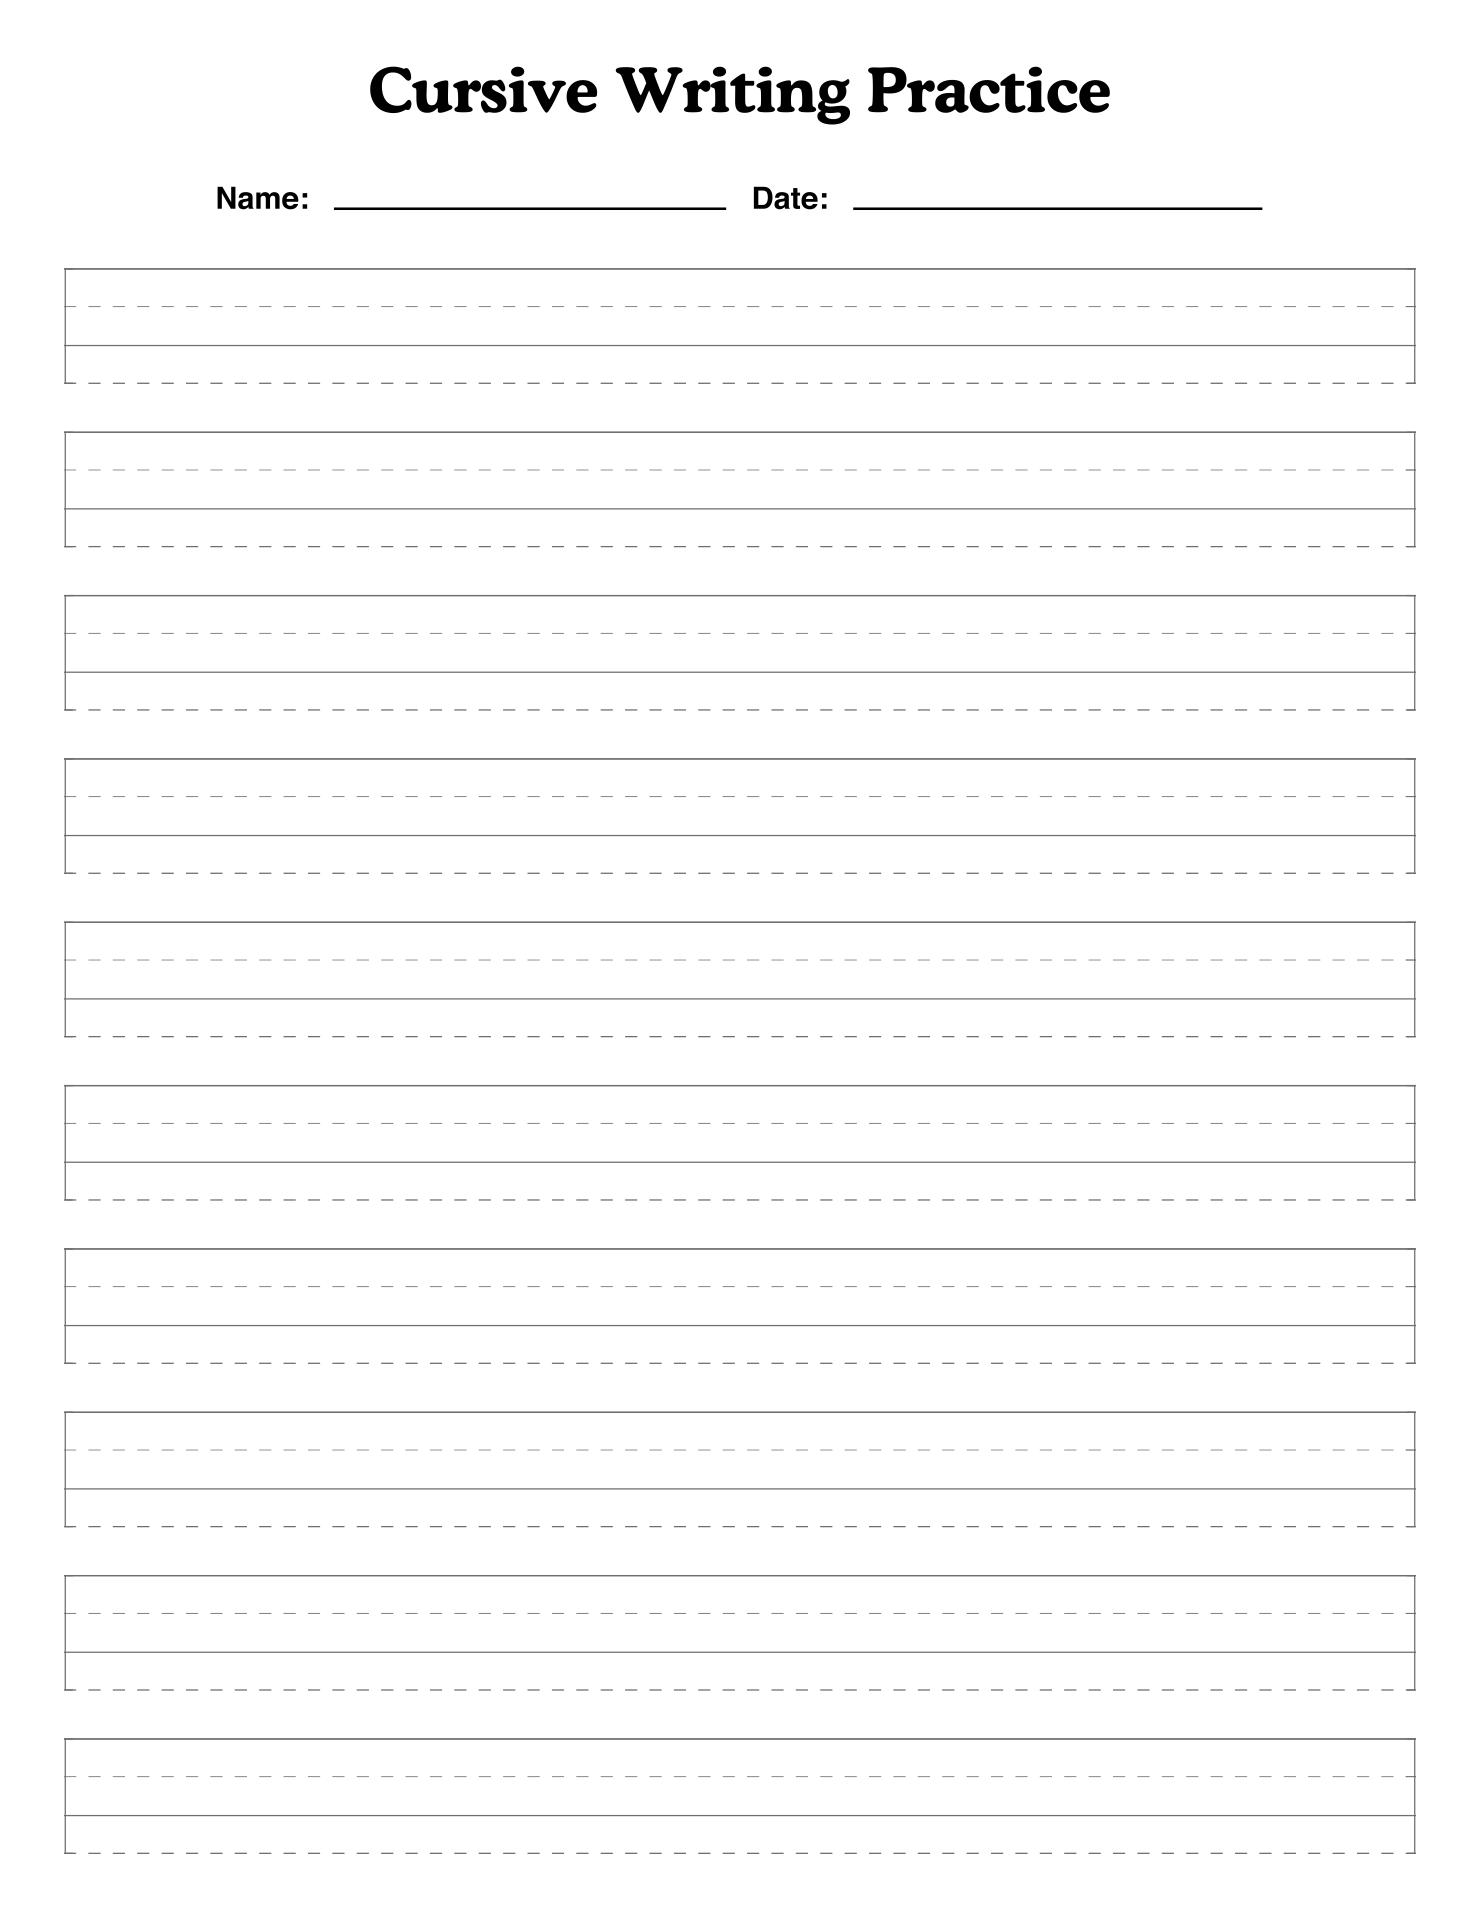 Blank Cursive Writing Practice Sheets